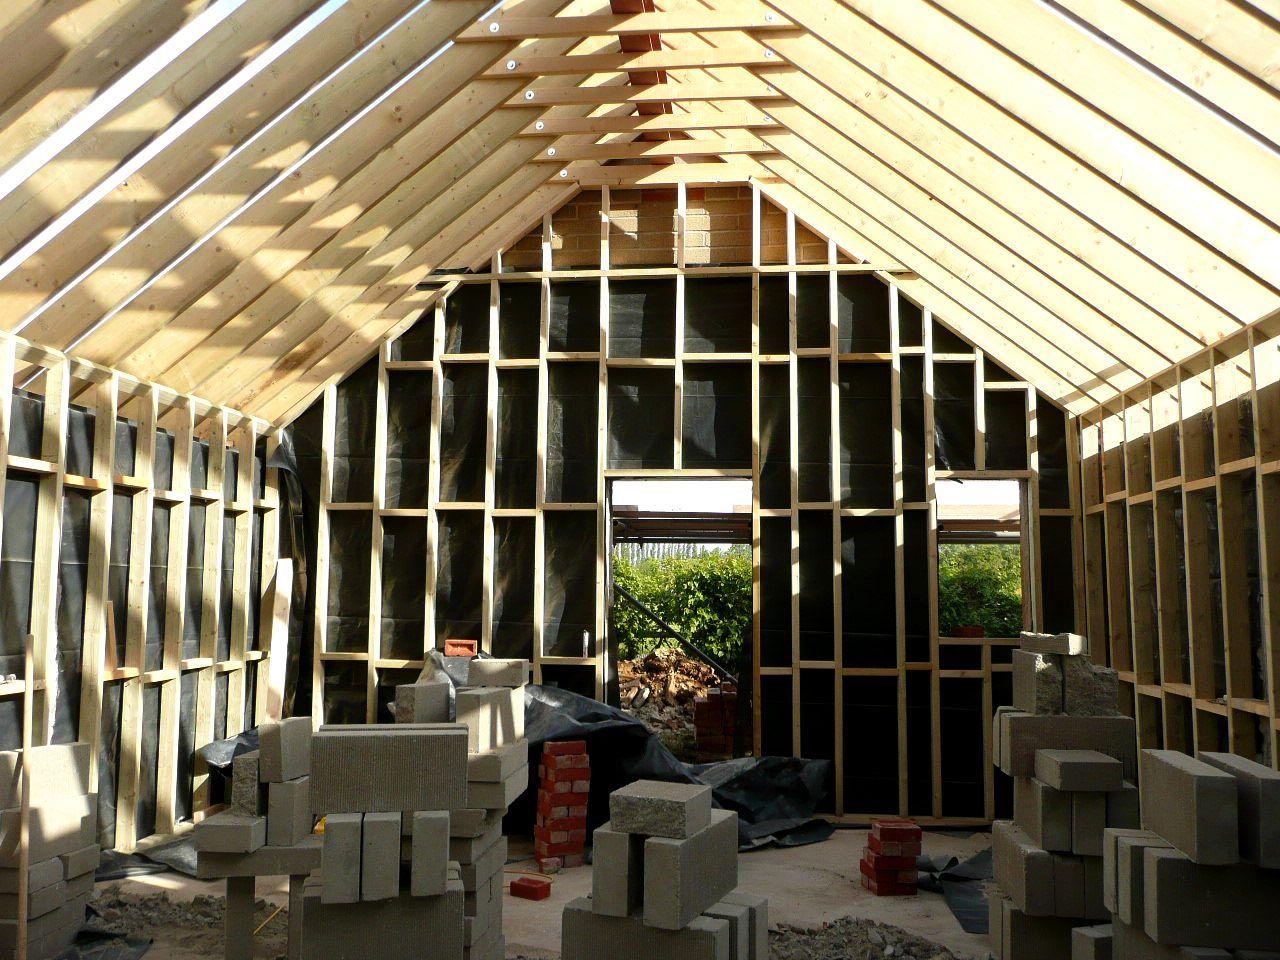 Marks Tey Essex 1st Fix Timber Studwork Walls Under